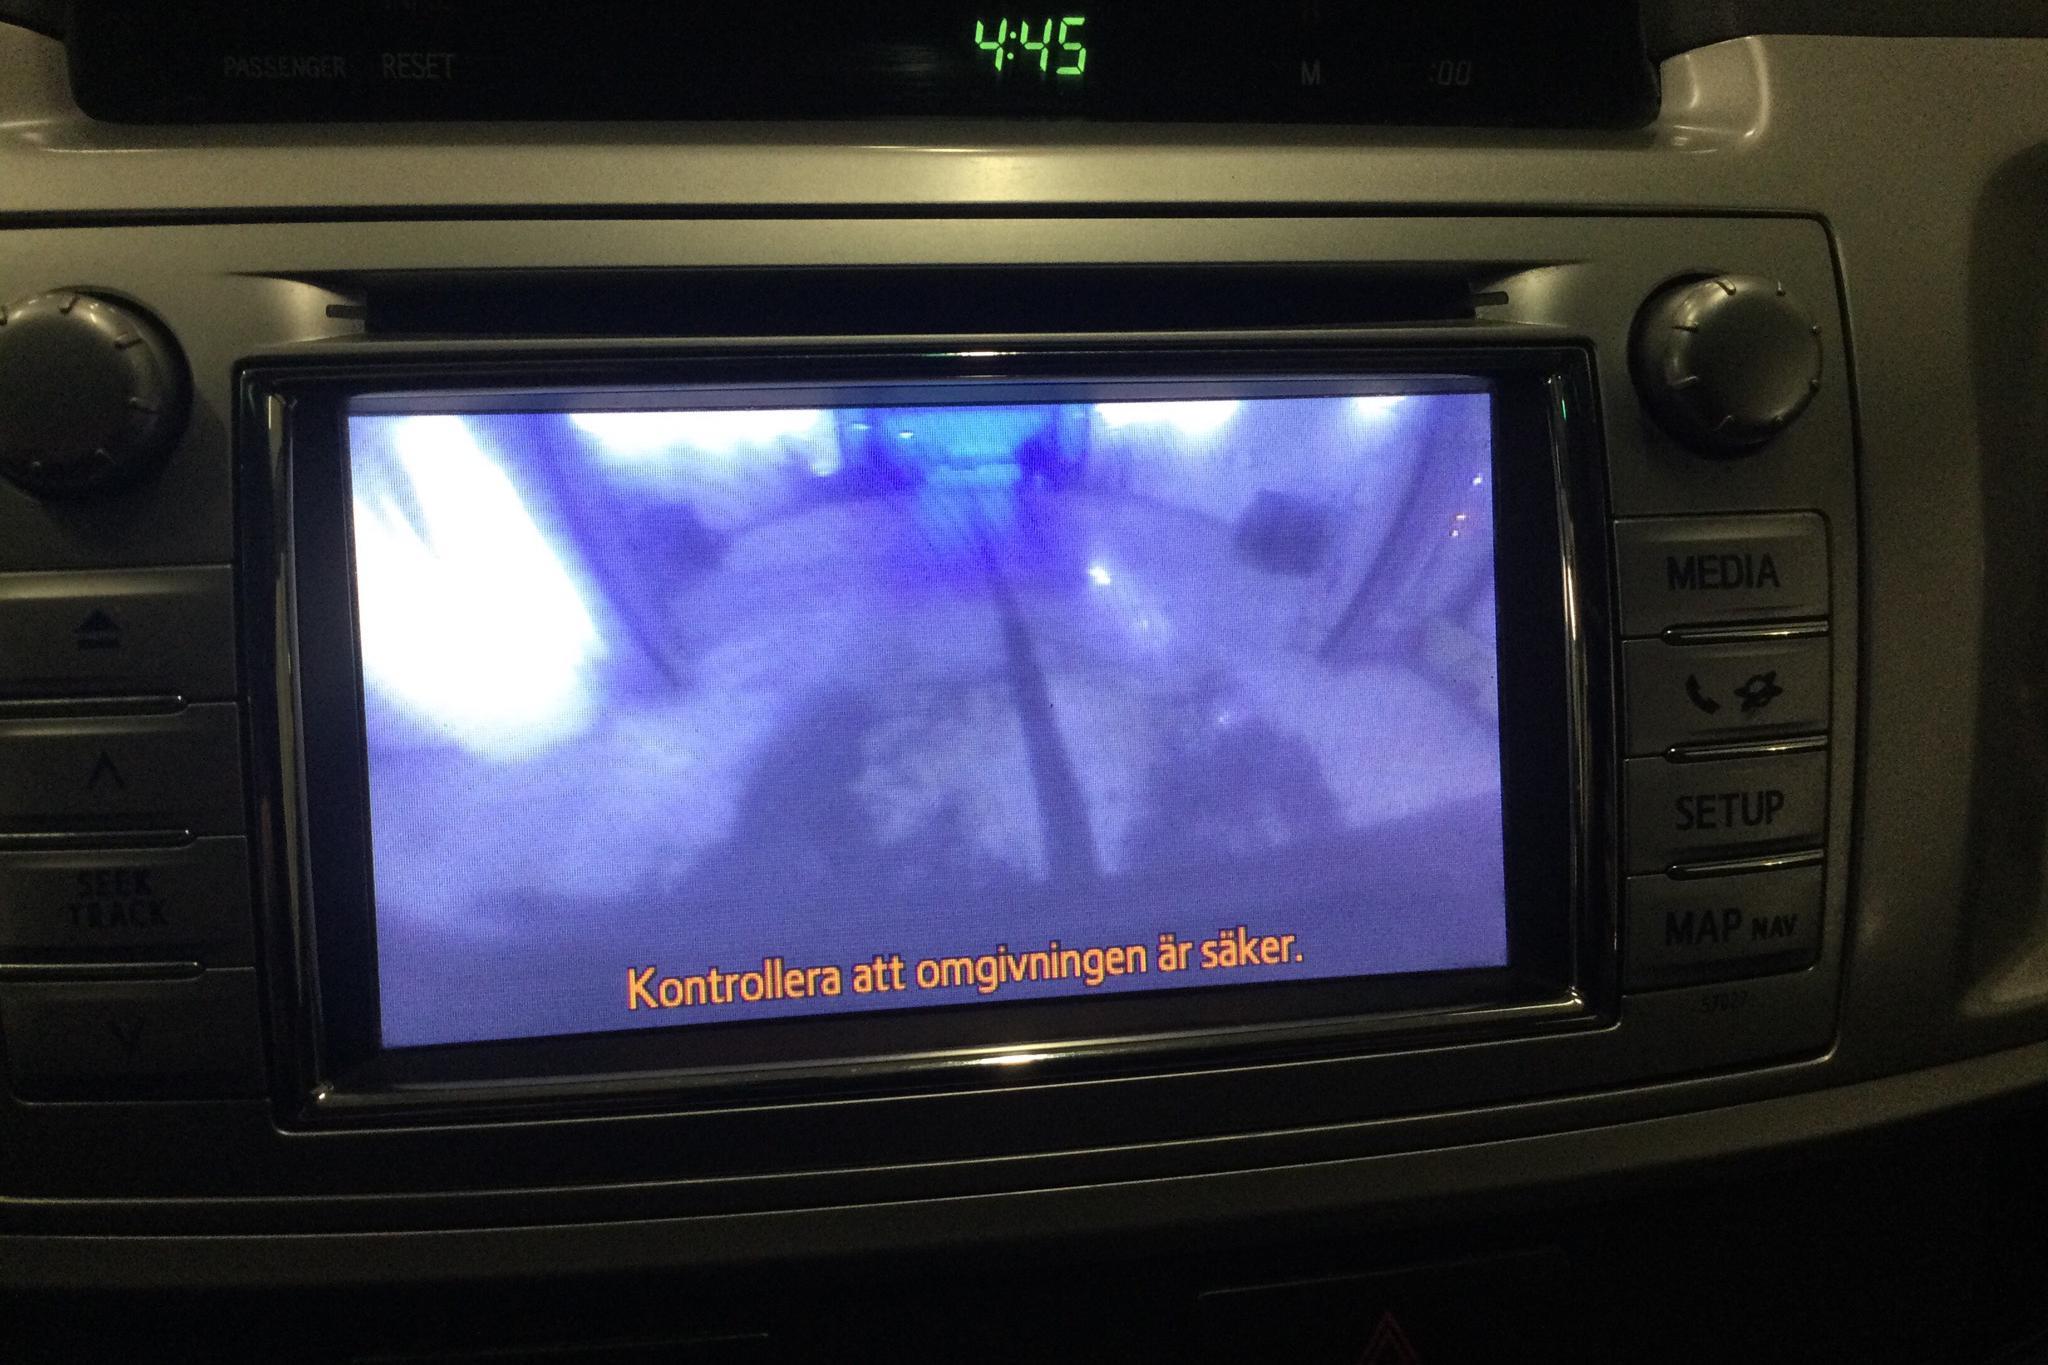 Toyota Hilux 3.0 D-4D 4WD (171hk) - 28 332 mil - Automat - svart - 2012